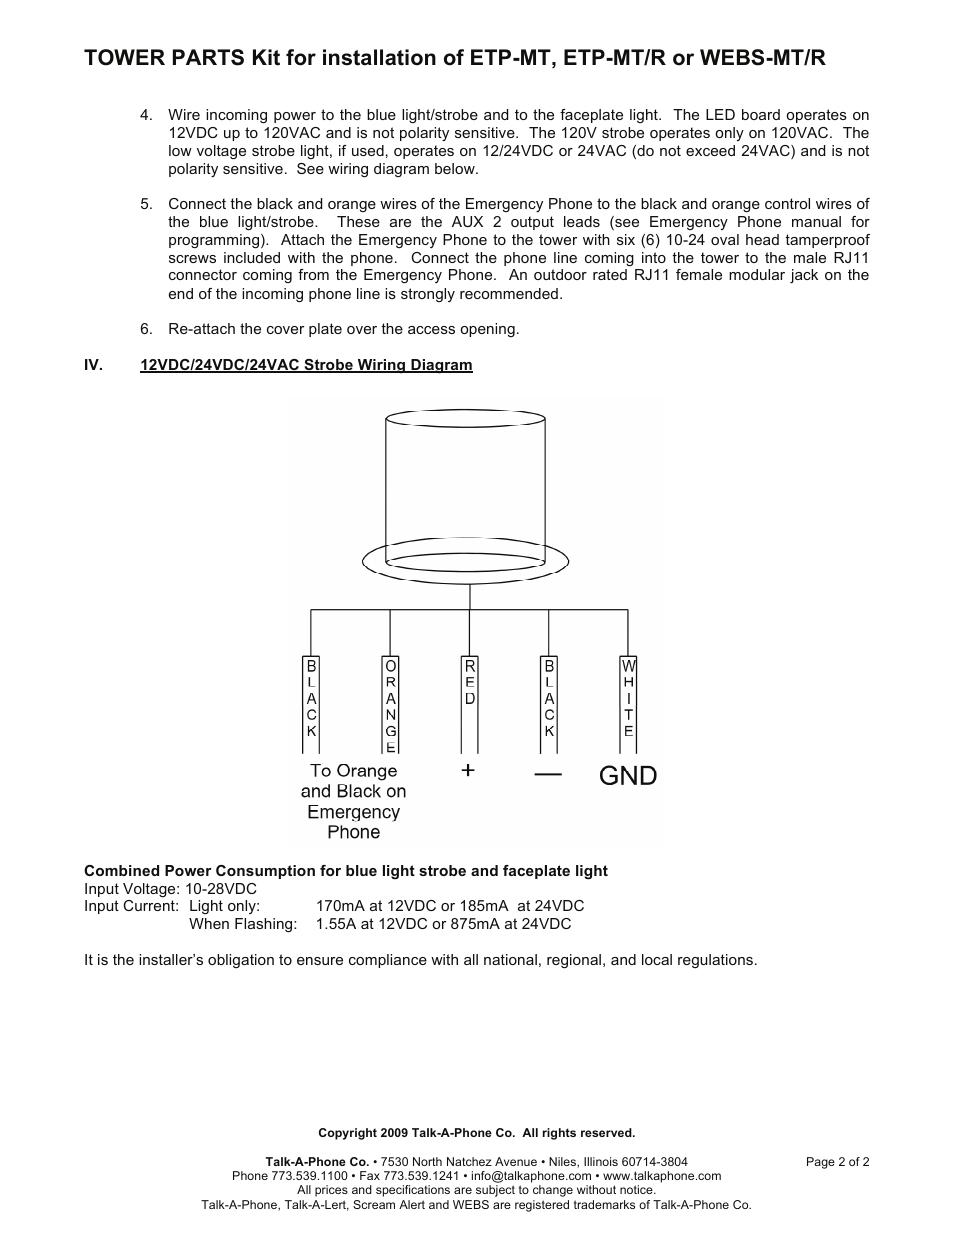 medium resolution of talkaphone etp mt blue light emergency phone tower user manual page 2 2 also for etp mt r op5 cctv radius emergency phone tower etp mt r op4 radius